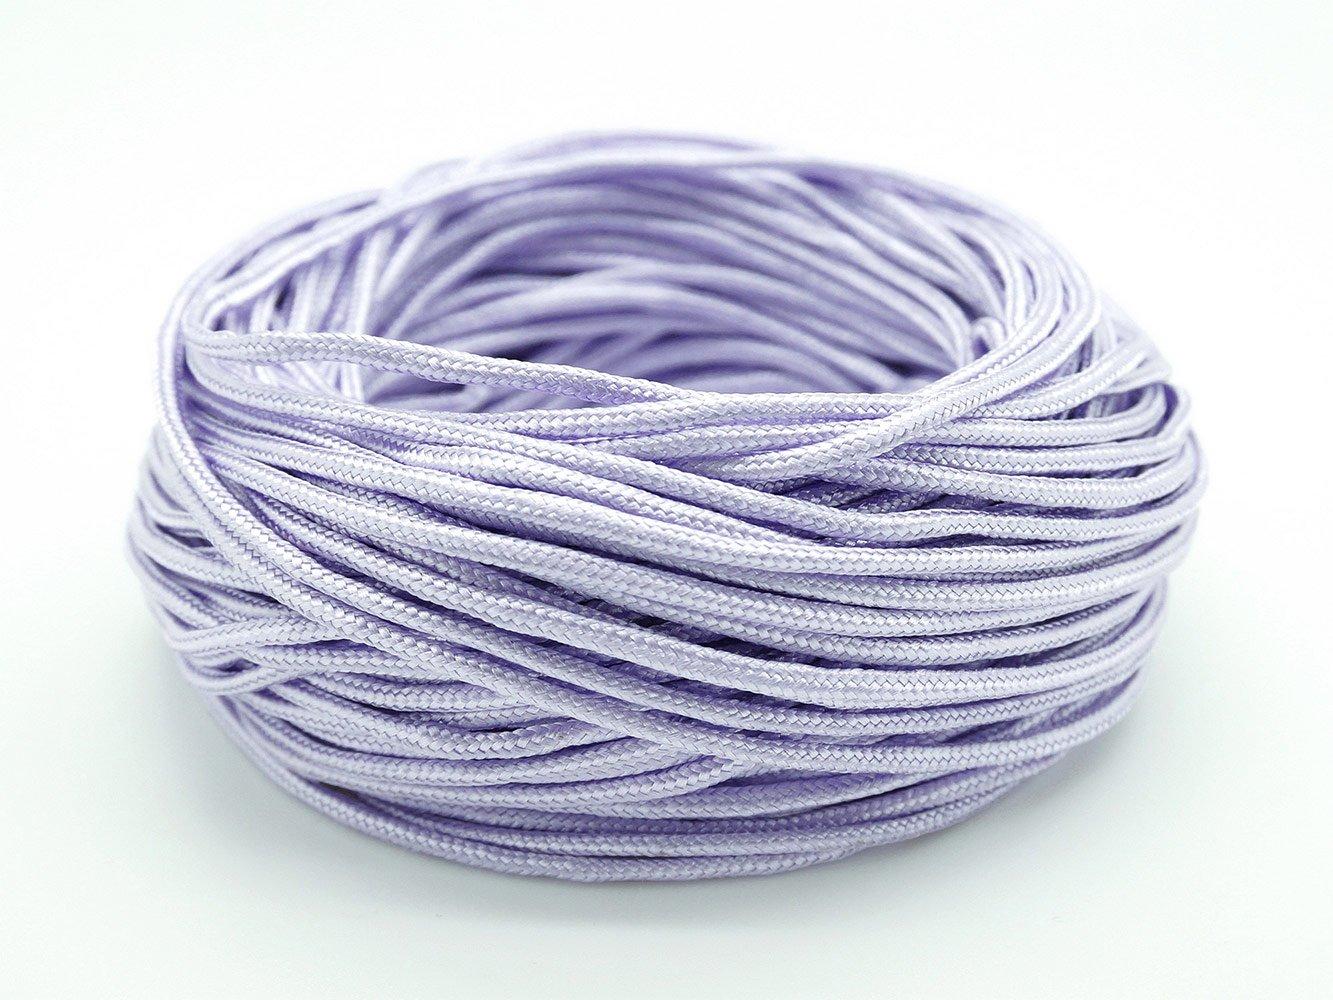 LAVENDER 2mm Chinese Knot Nylon Cord Shamballa Macrame Beading Kumihimo String - 20 Yards Craft & Beads